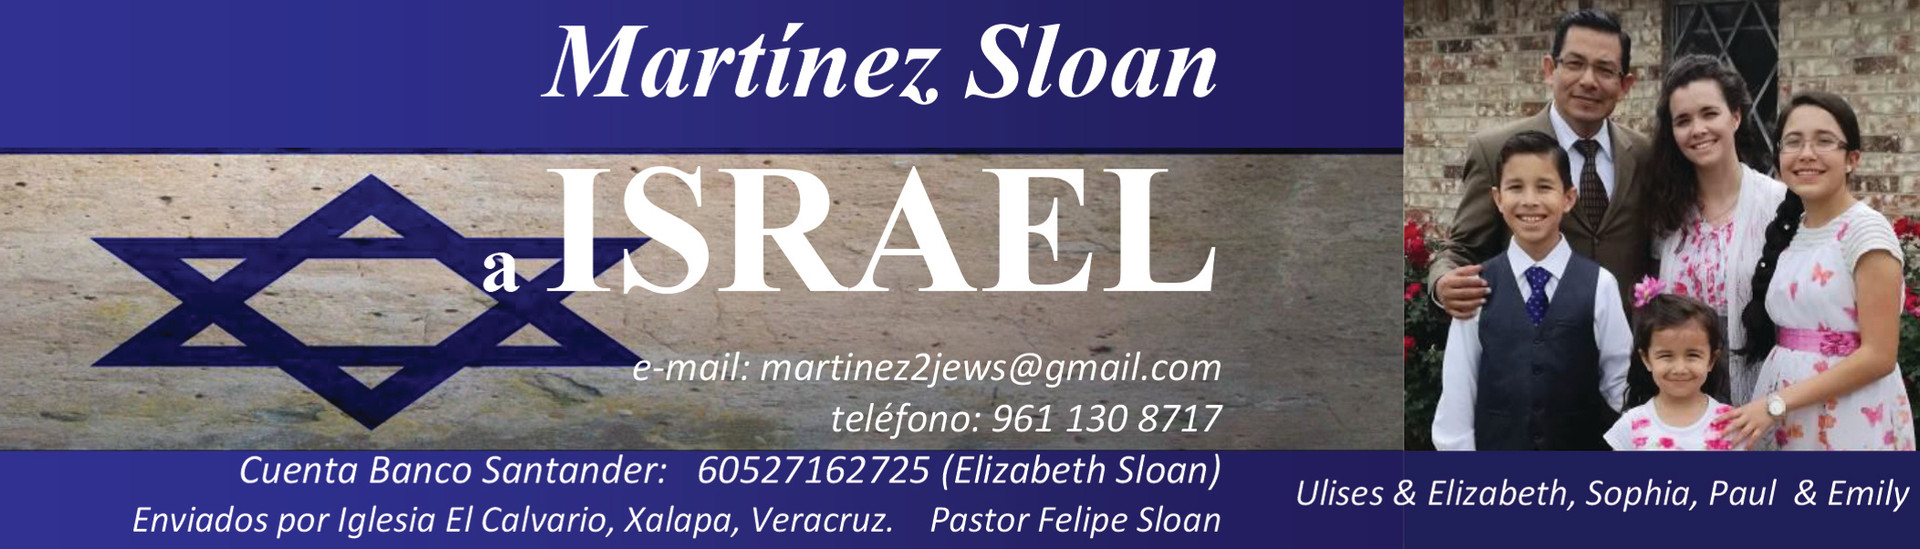 Misioneros Martinez Sloan